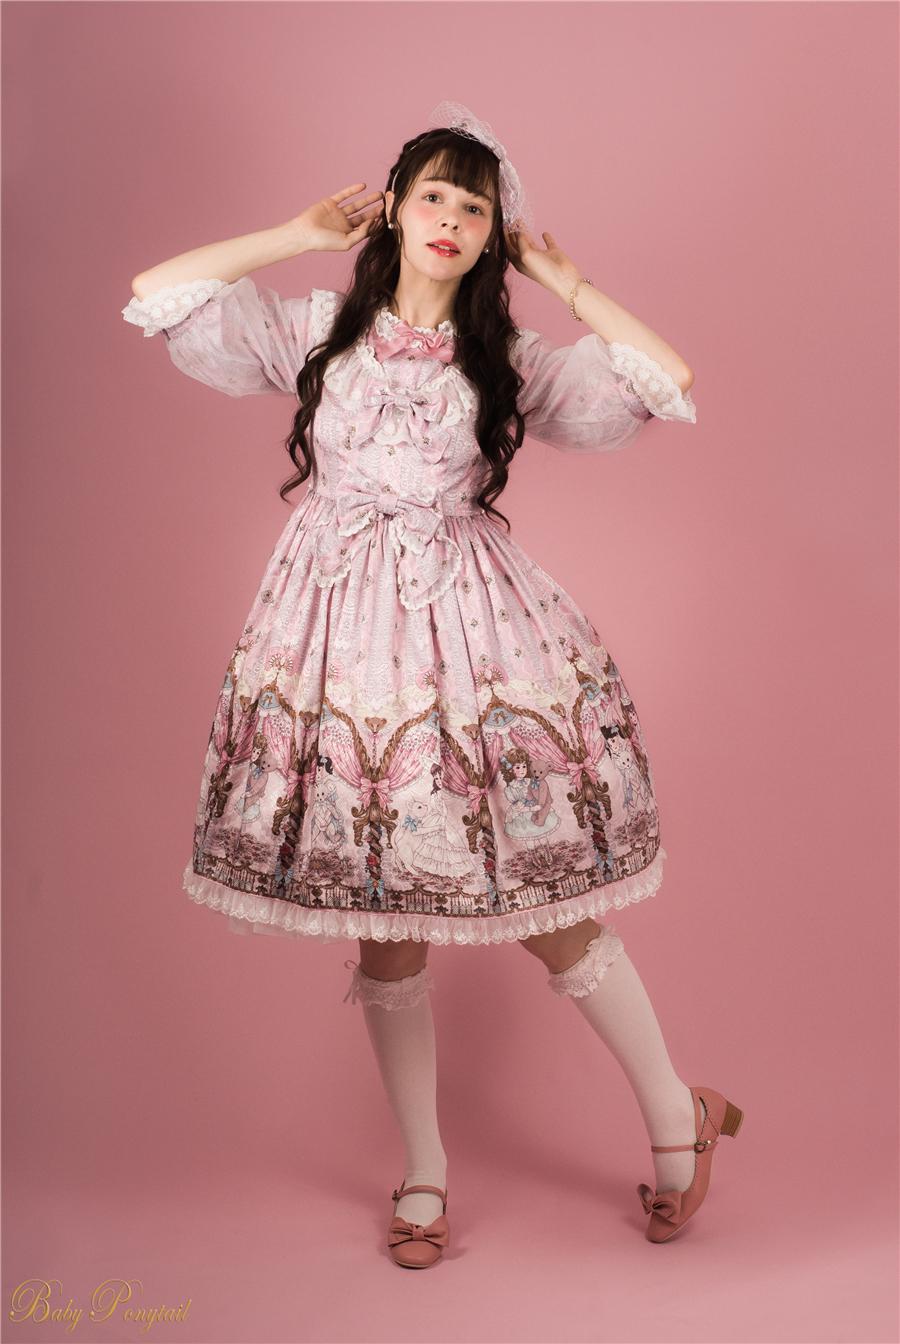 BabyPonytail_Model Photo_My Favorite Companion_OP Pink_7.jpg